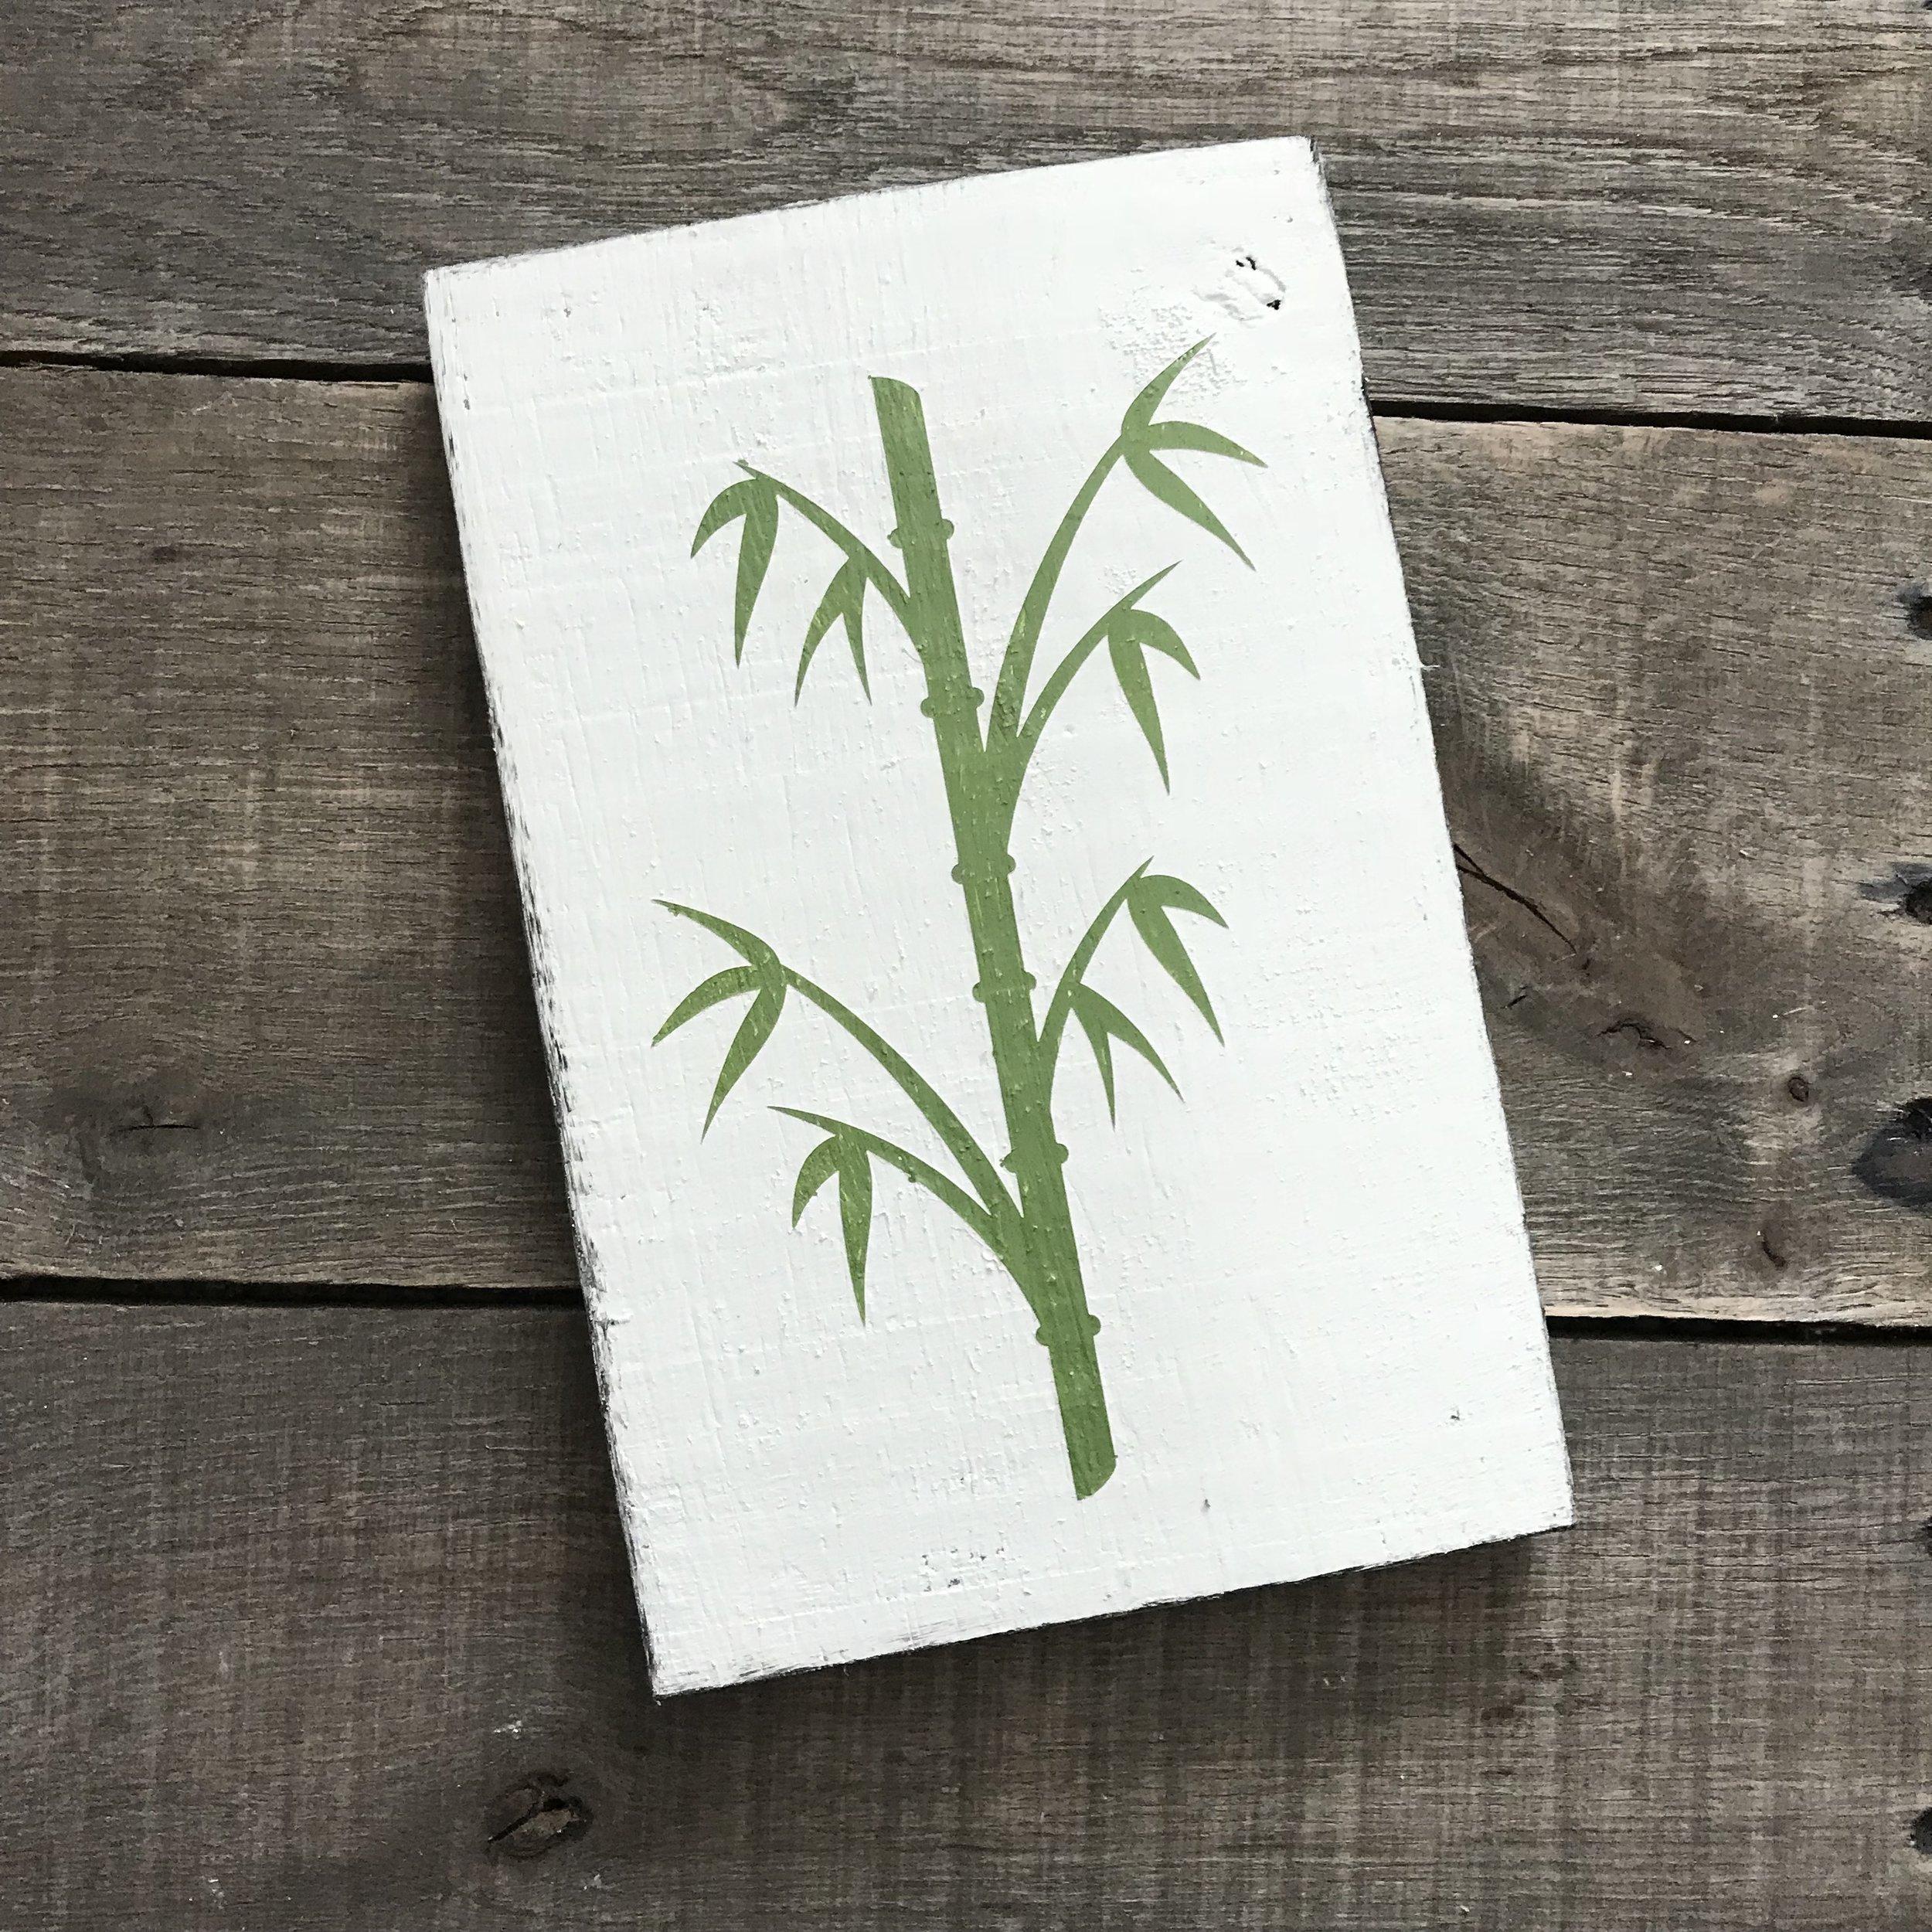 Green Bamboo sign